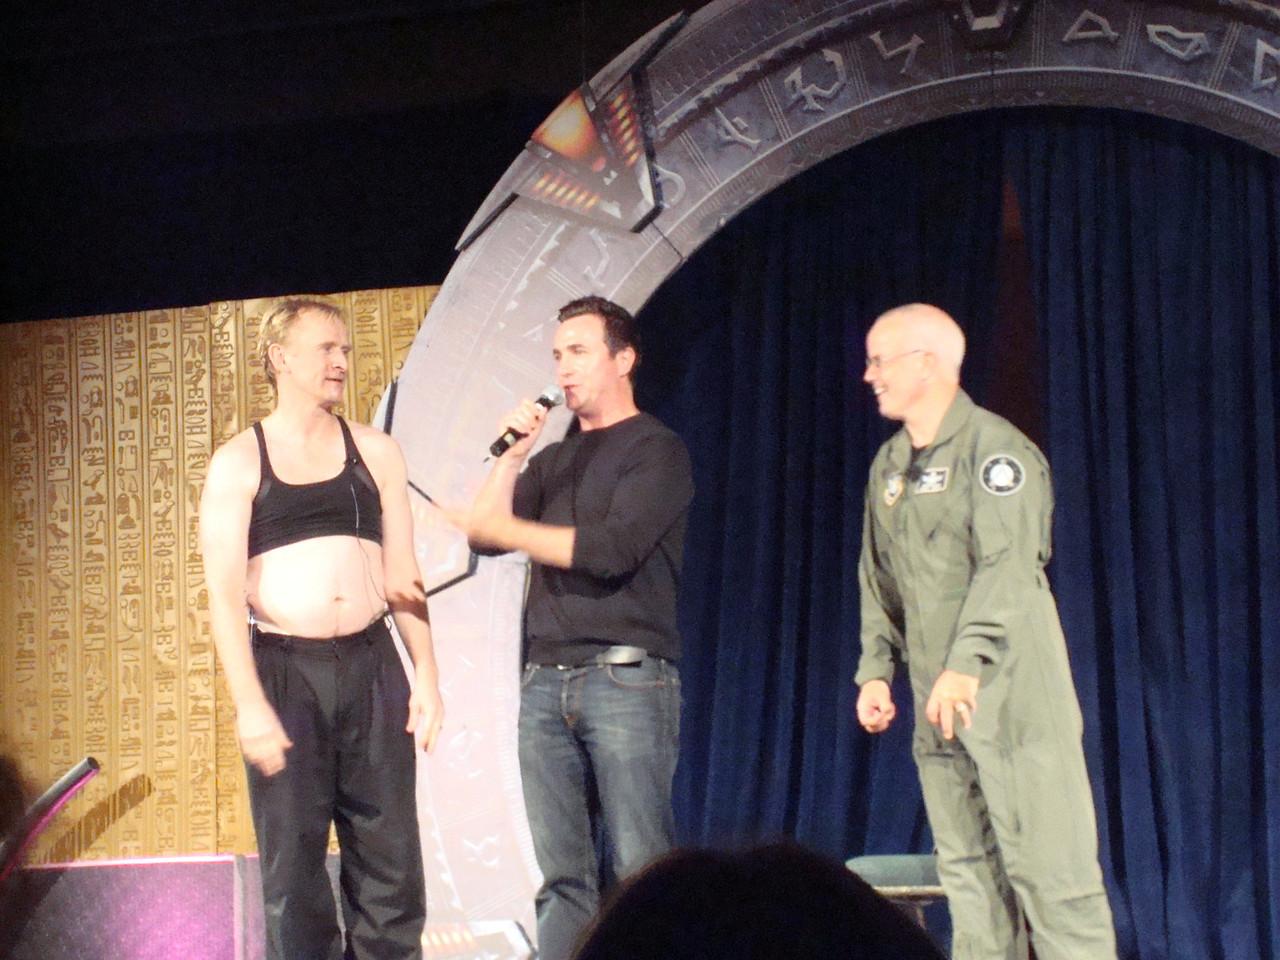 Starhole (play/improv thing). Dean Haglund, Paul McGillion, Gary Jones.